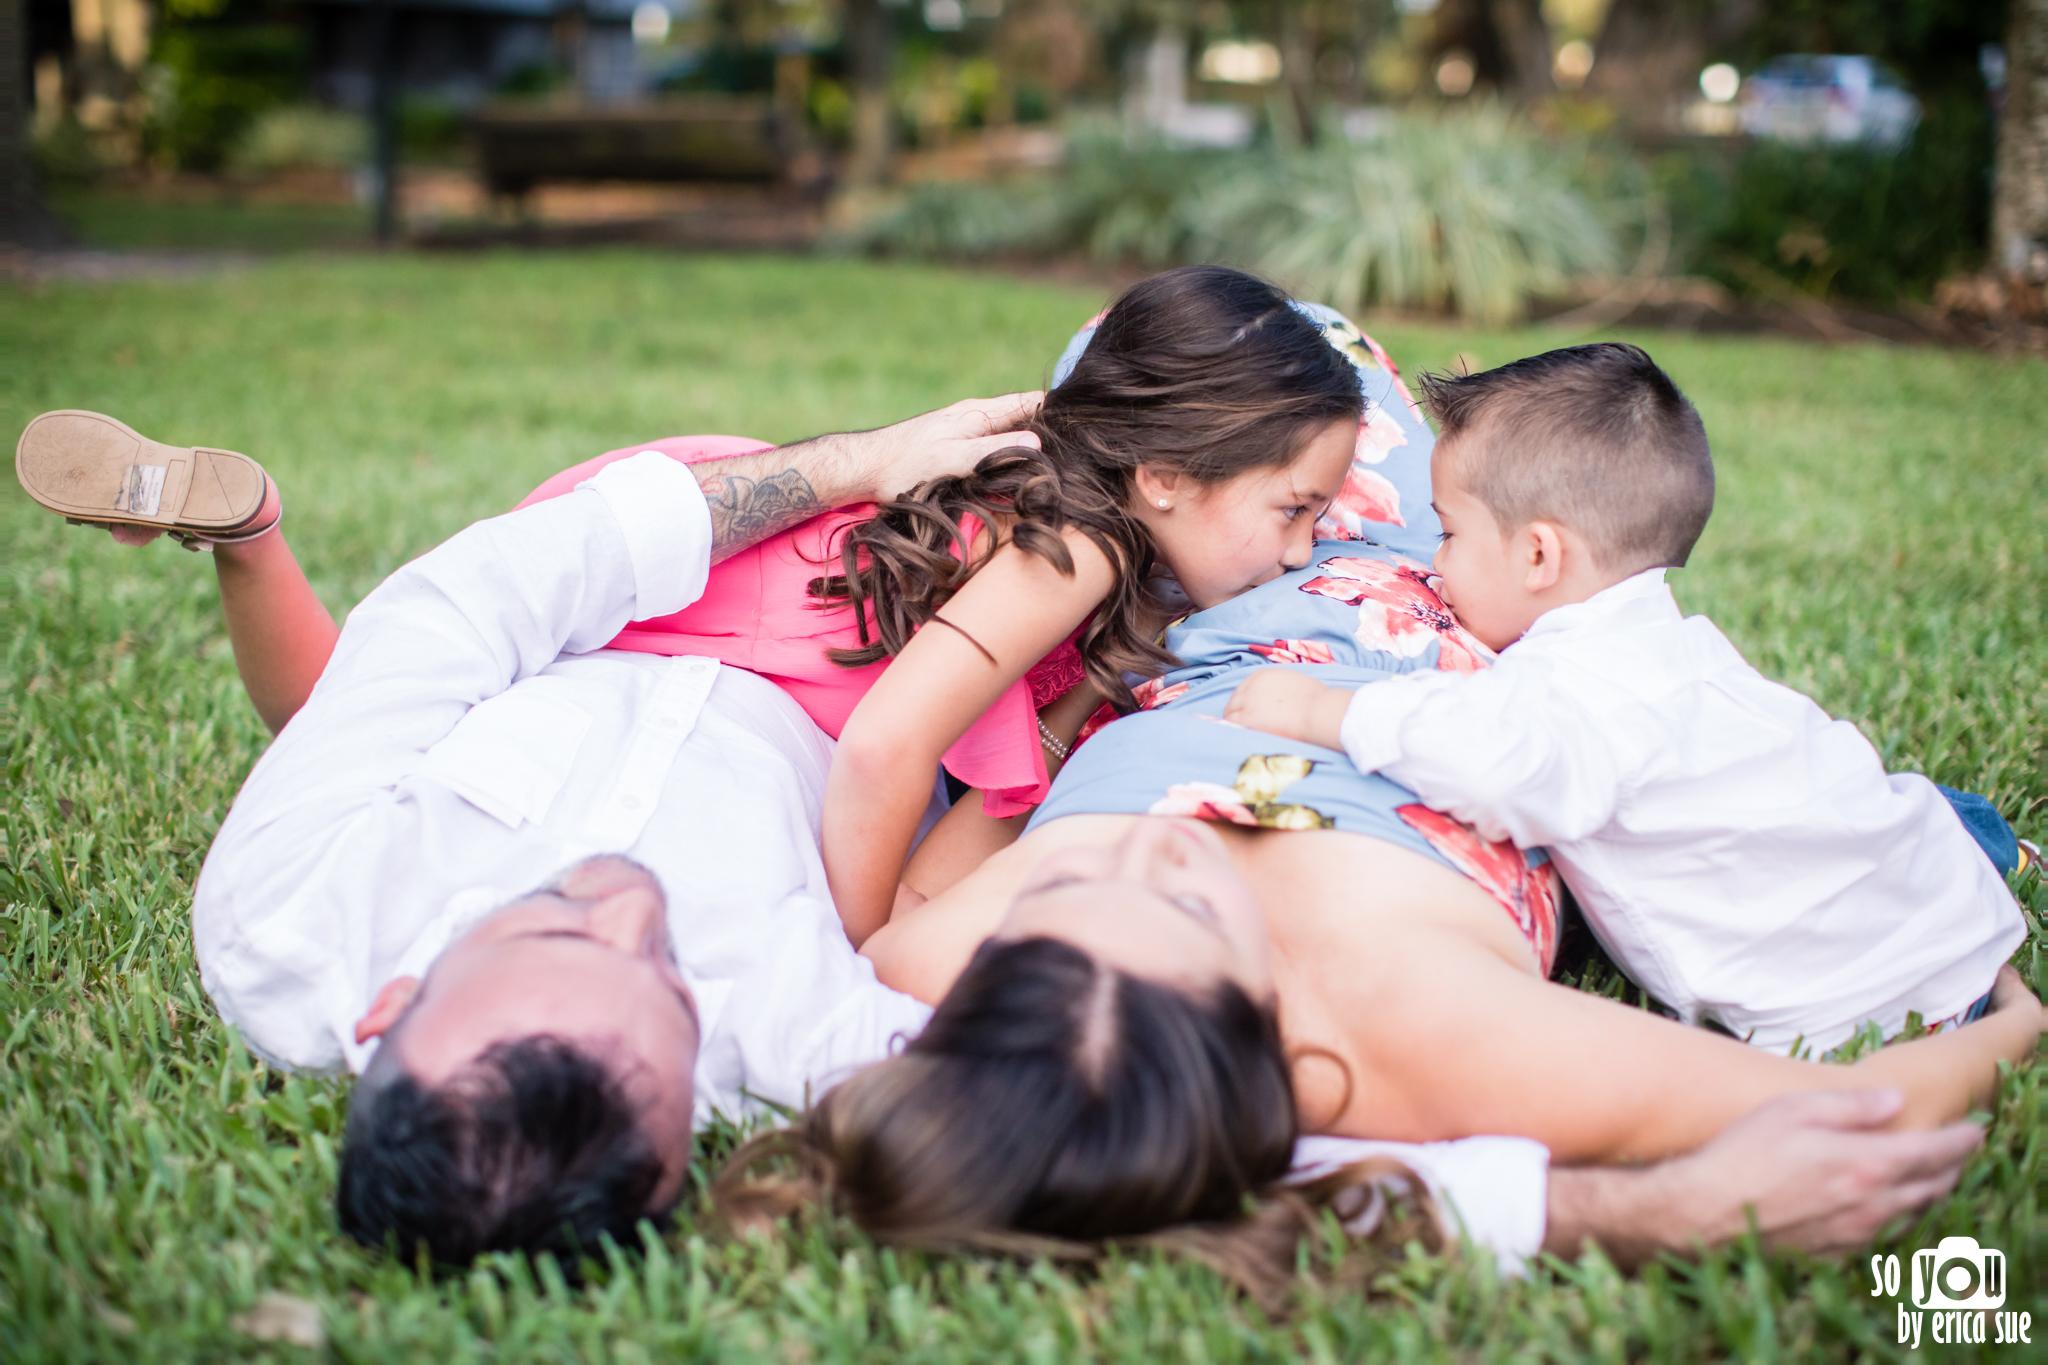 so-you-by-erica-sue-davie-maternity-photographer-fl-.jpg